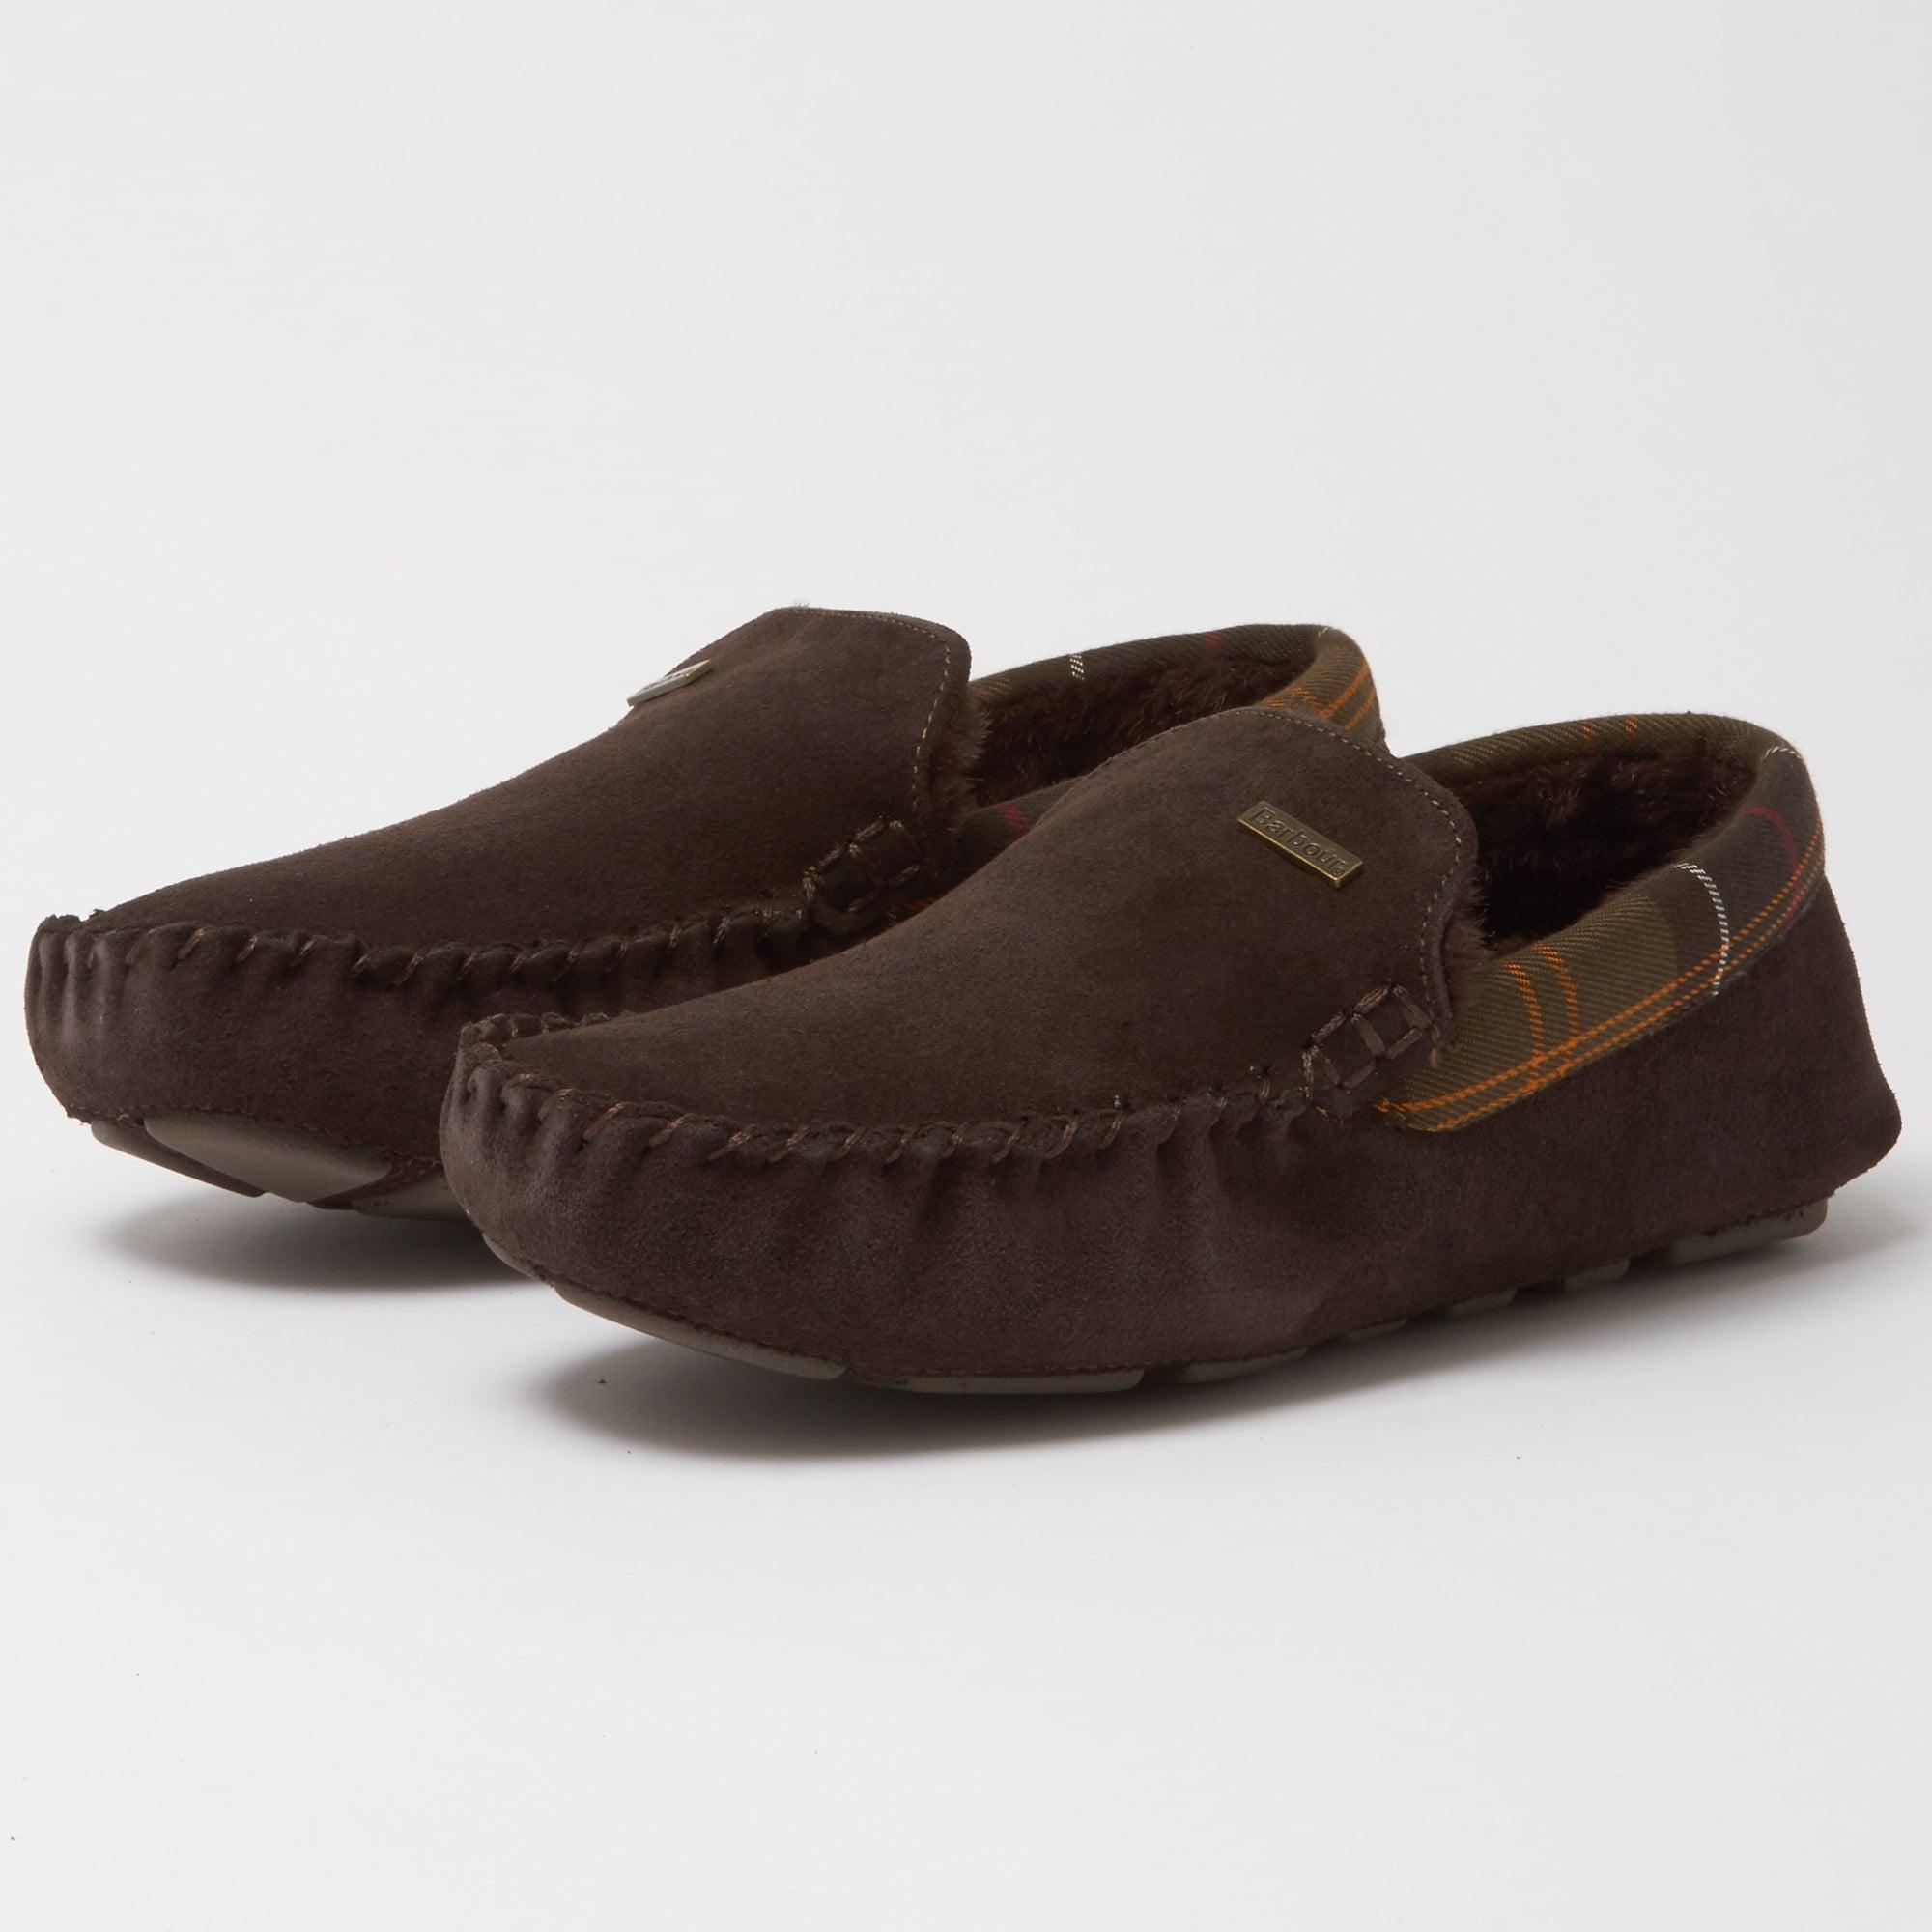 Barbour Footwear Monty Brown Shoes MFO0217BR51